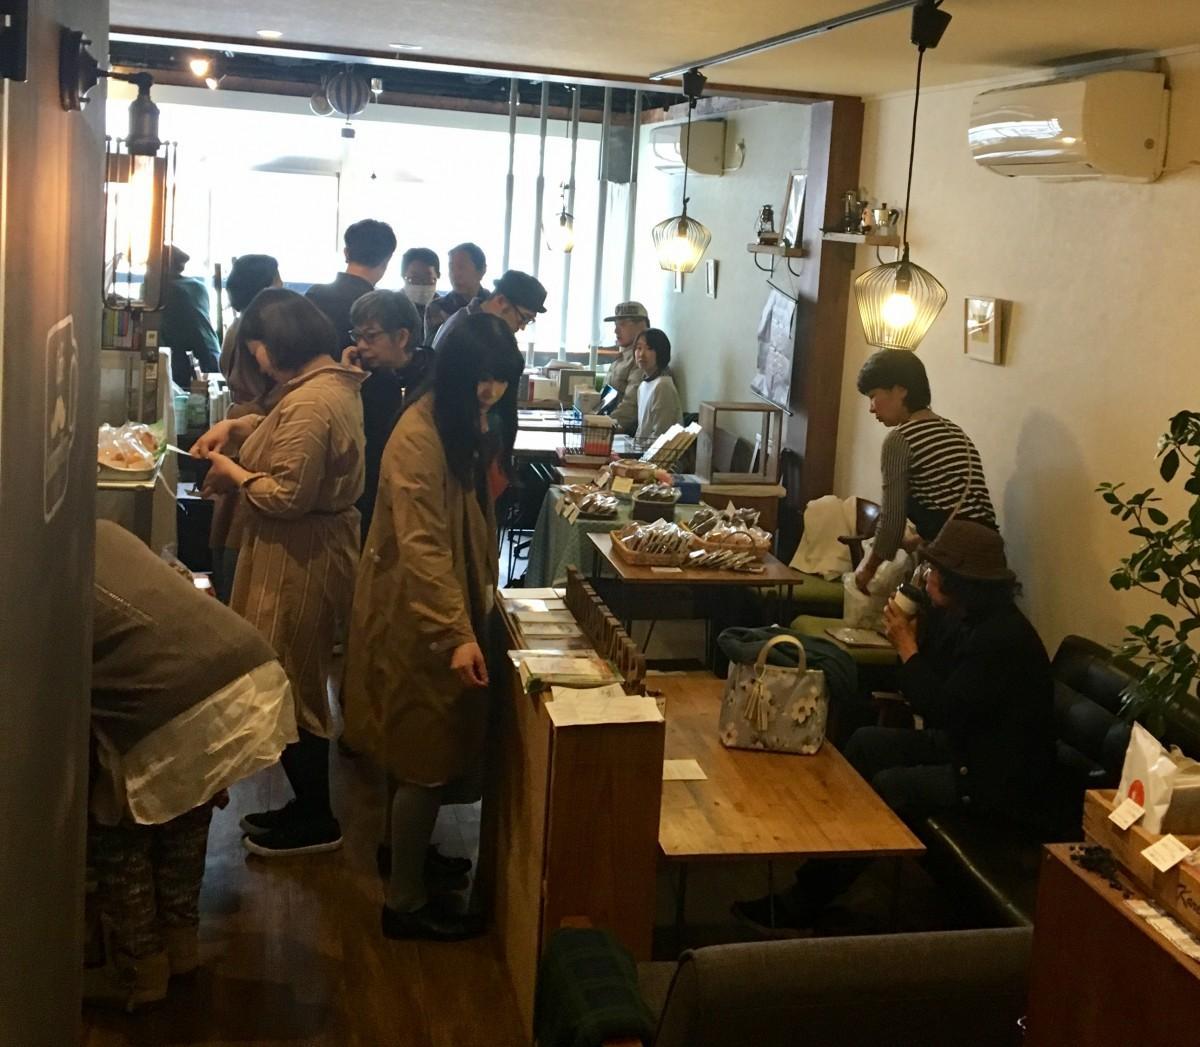 「Café SchnurrWarz」で行われた前回の「三鷹武蔵野BOOK+マルシェ」の様子